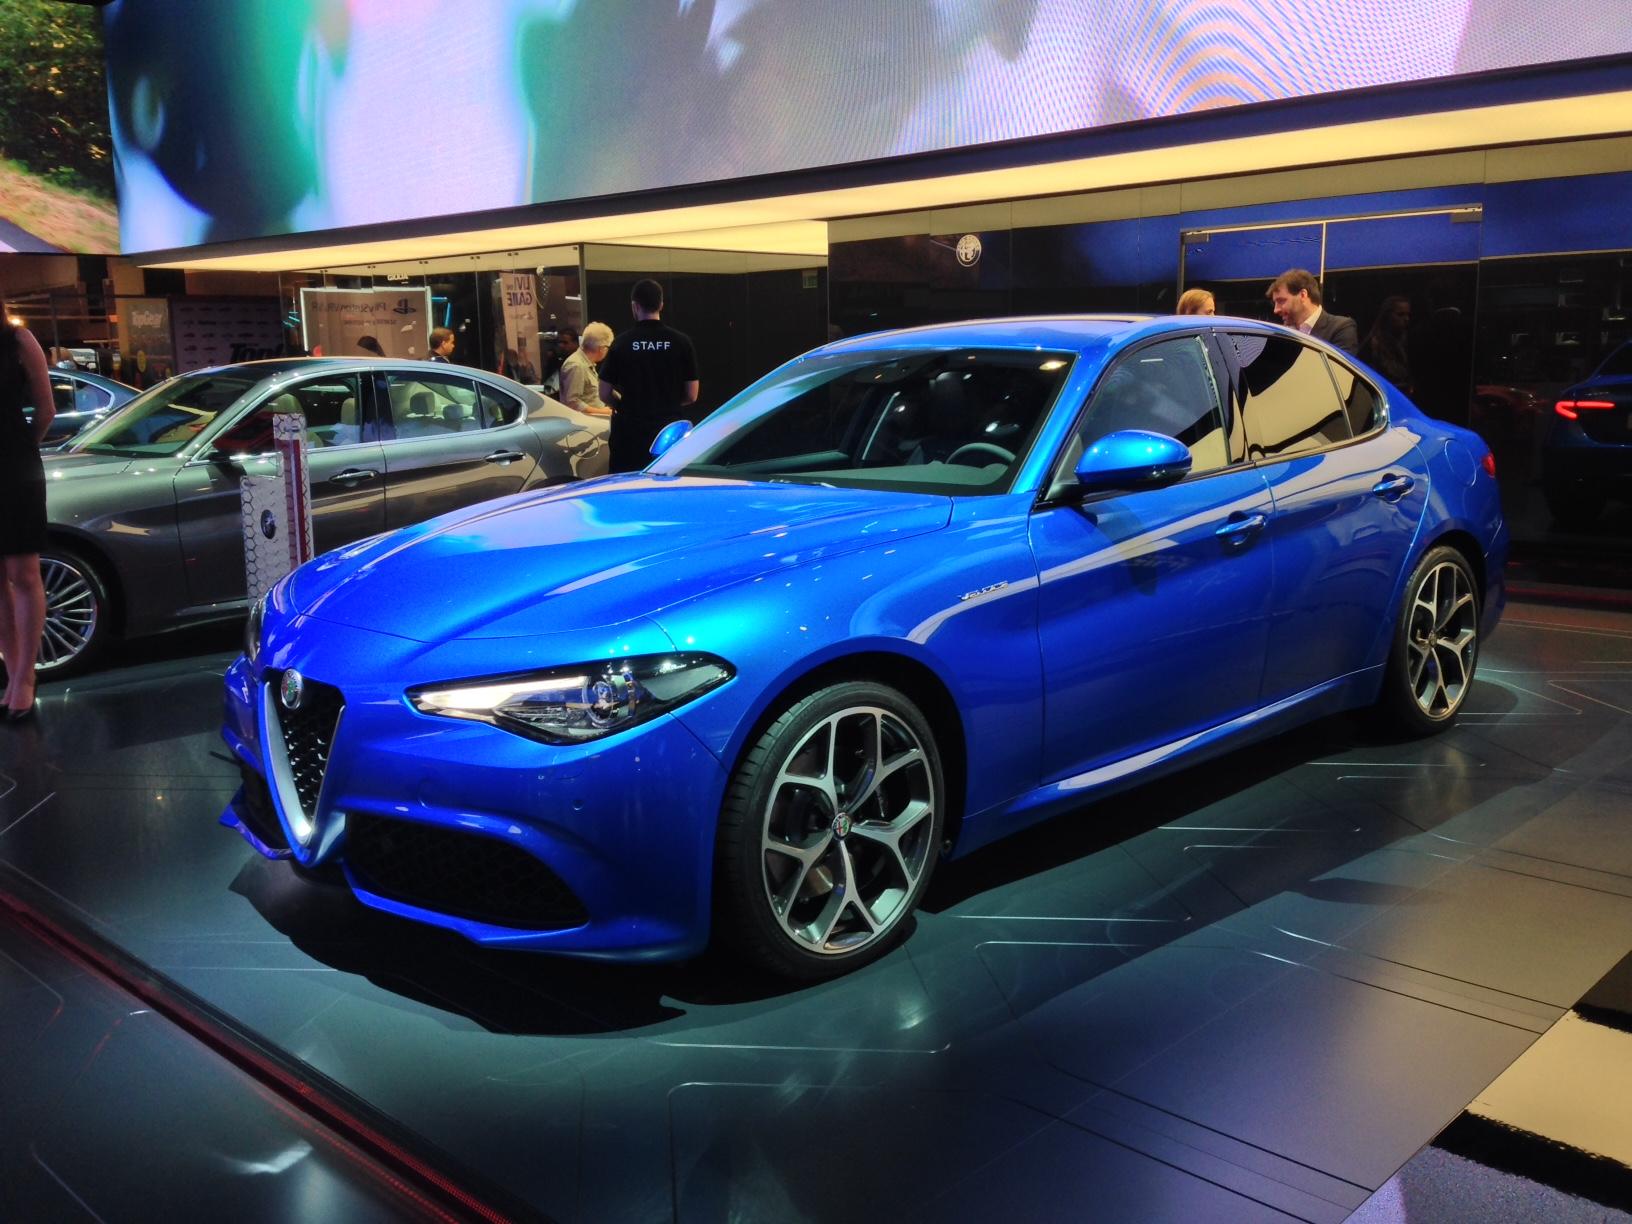 Alfa Romeo Giulia Review Prices Specs And 0 60 Time Evo